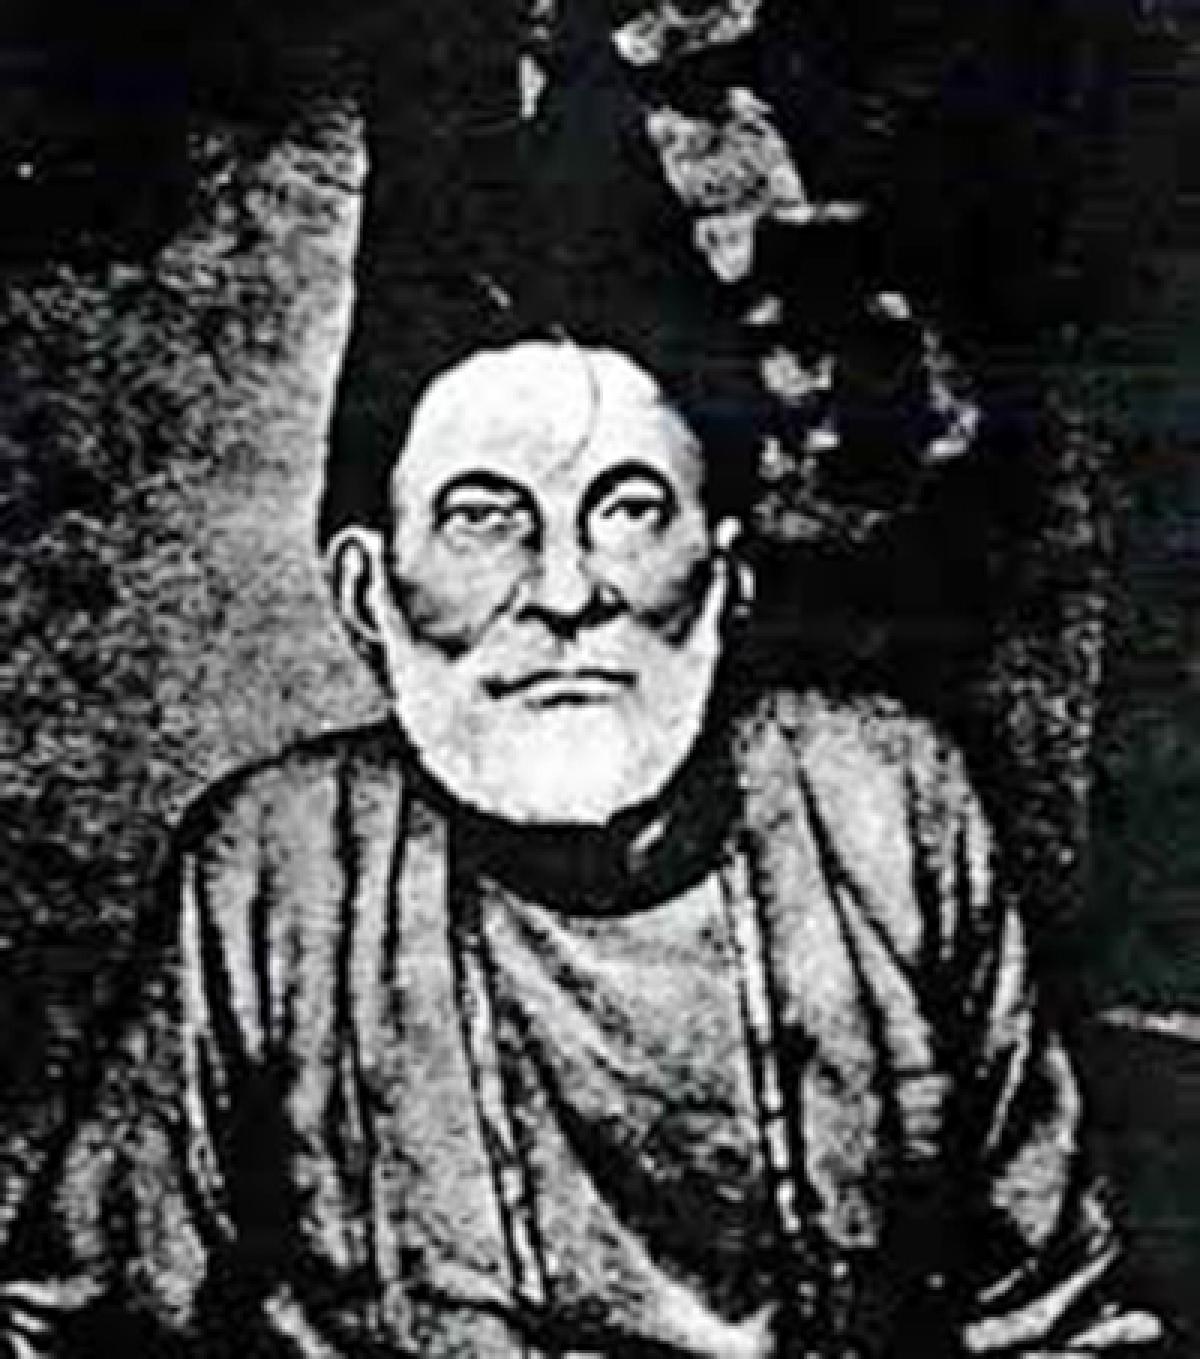 Mirza Ghalib still homeless in his birth place